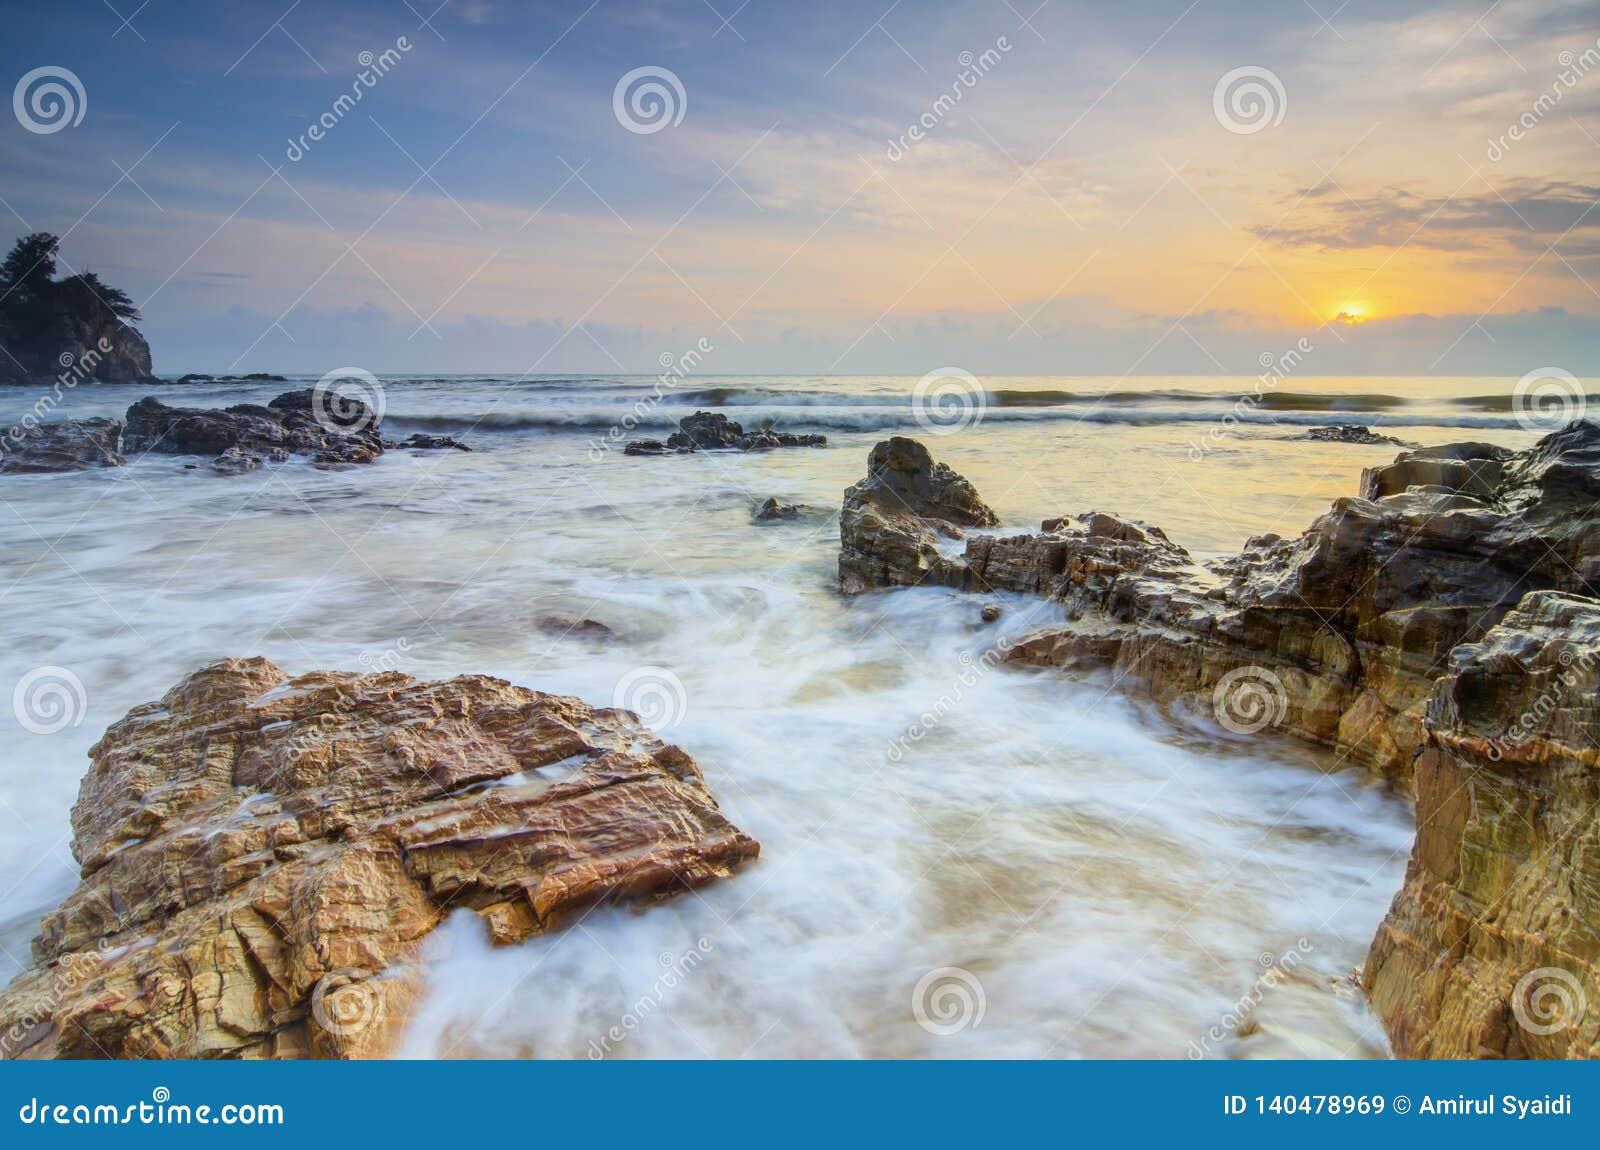 beautiful tropical beach sunrise sea view. soft wave hitting sandy beach